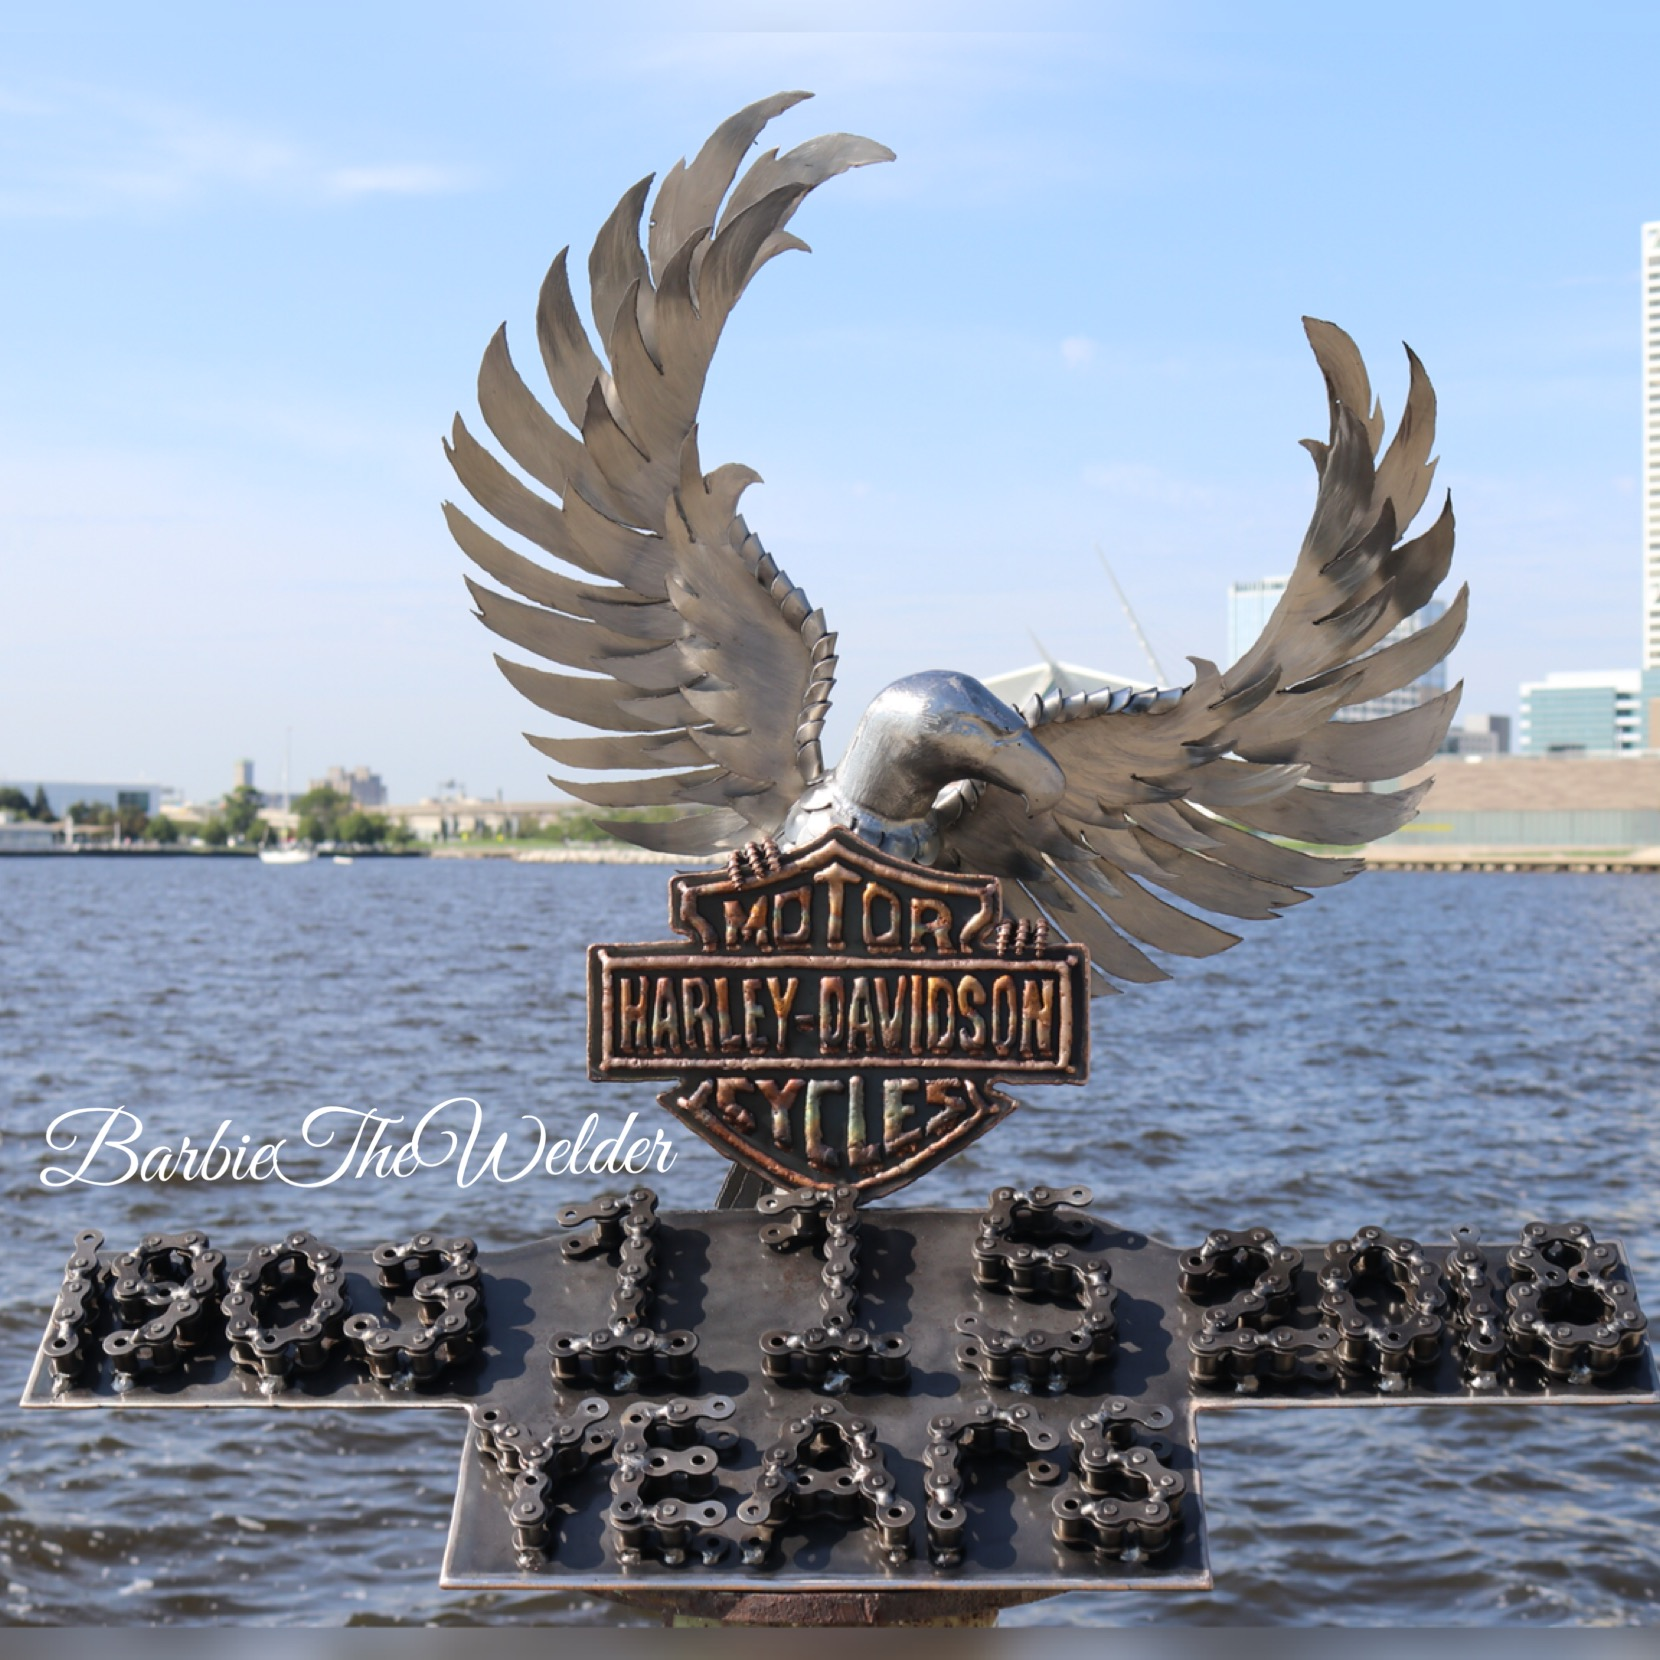 Harley Davidson 115th Anniversary Celebr